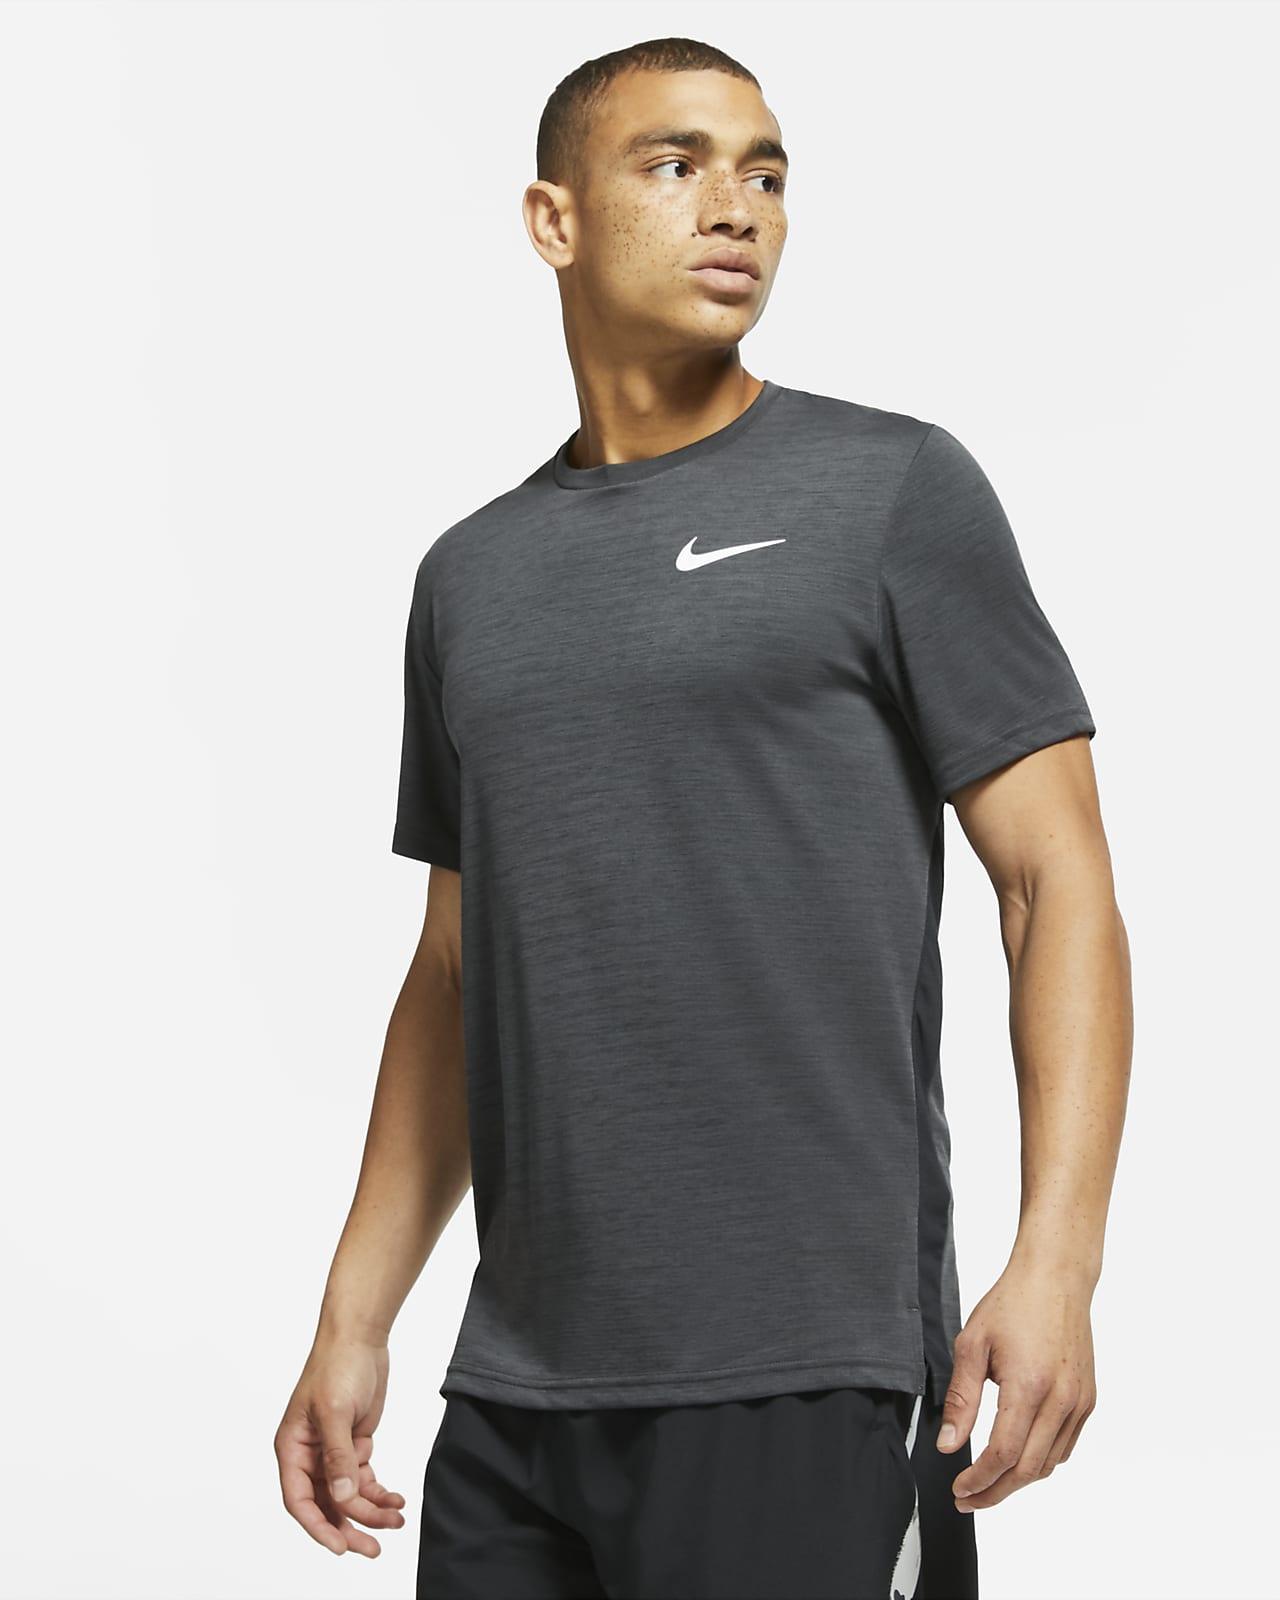 Nike Men's Short-Sleeve Top